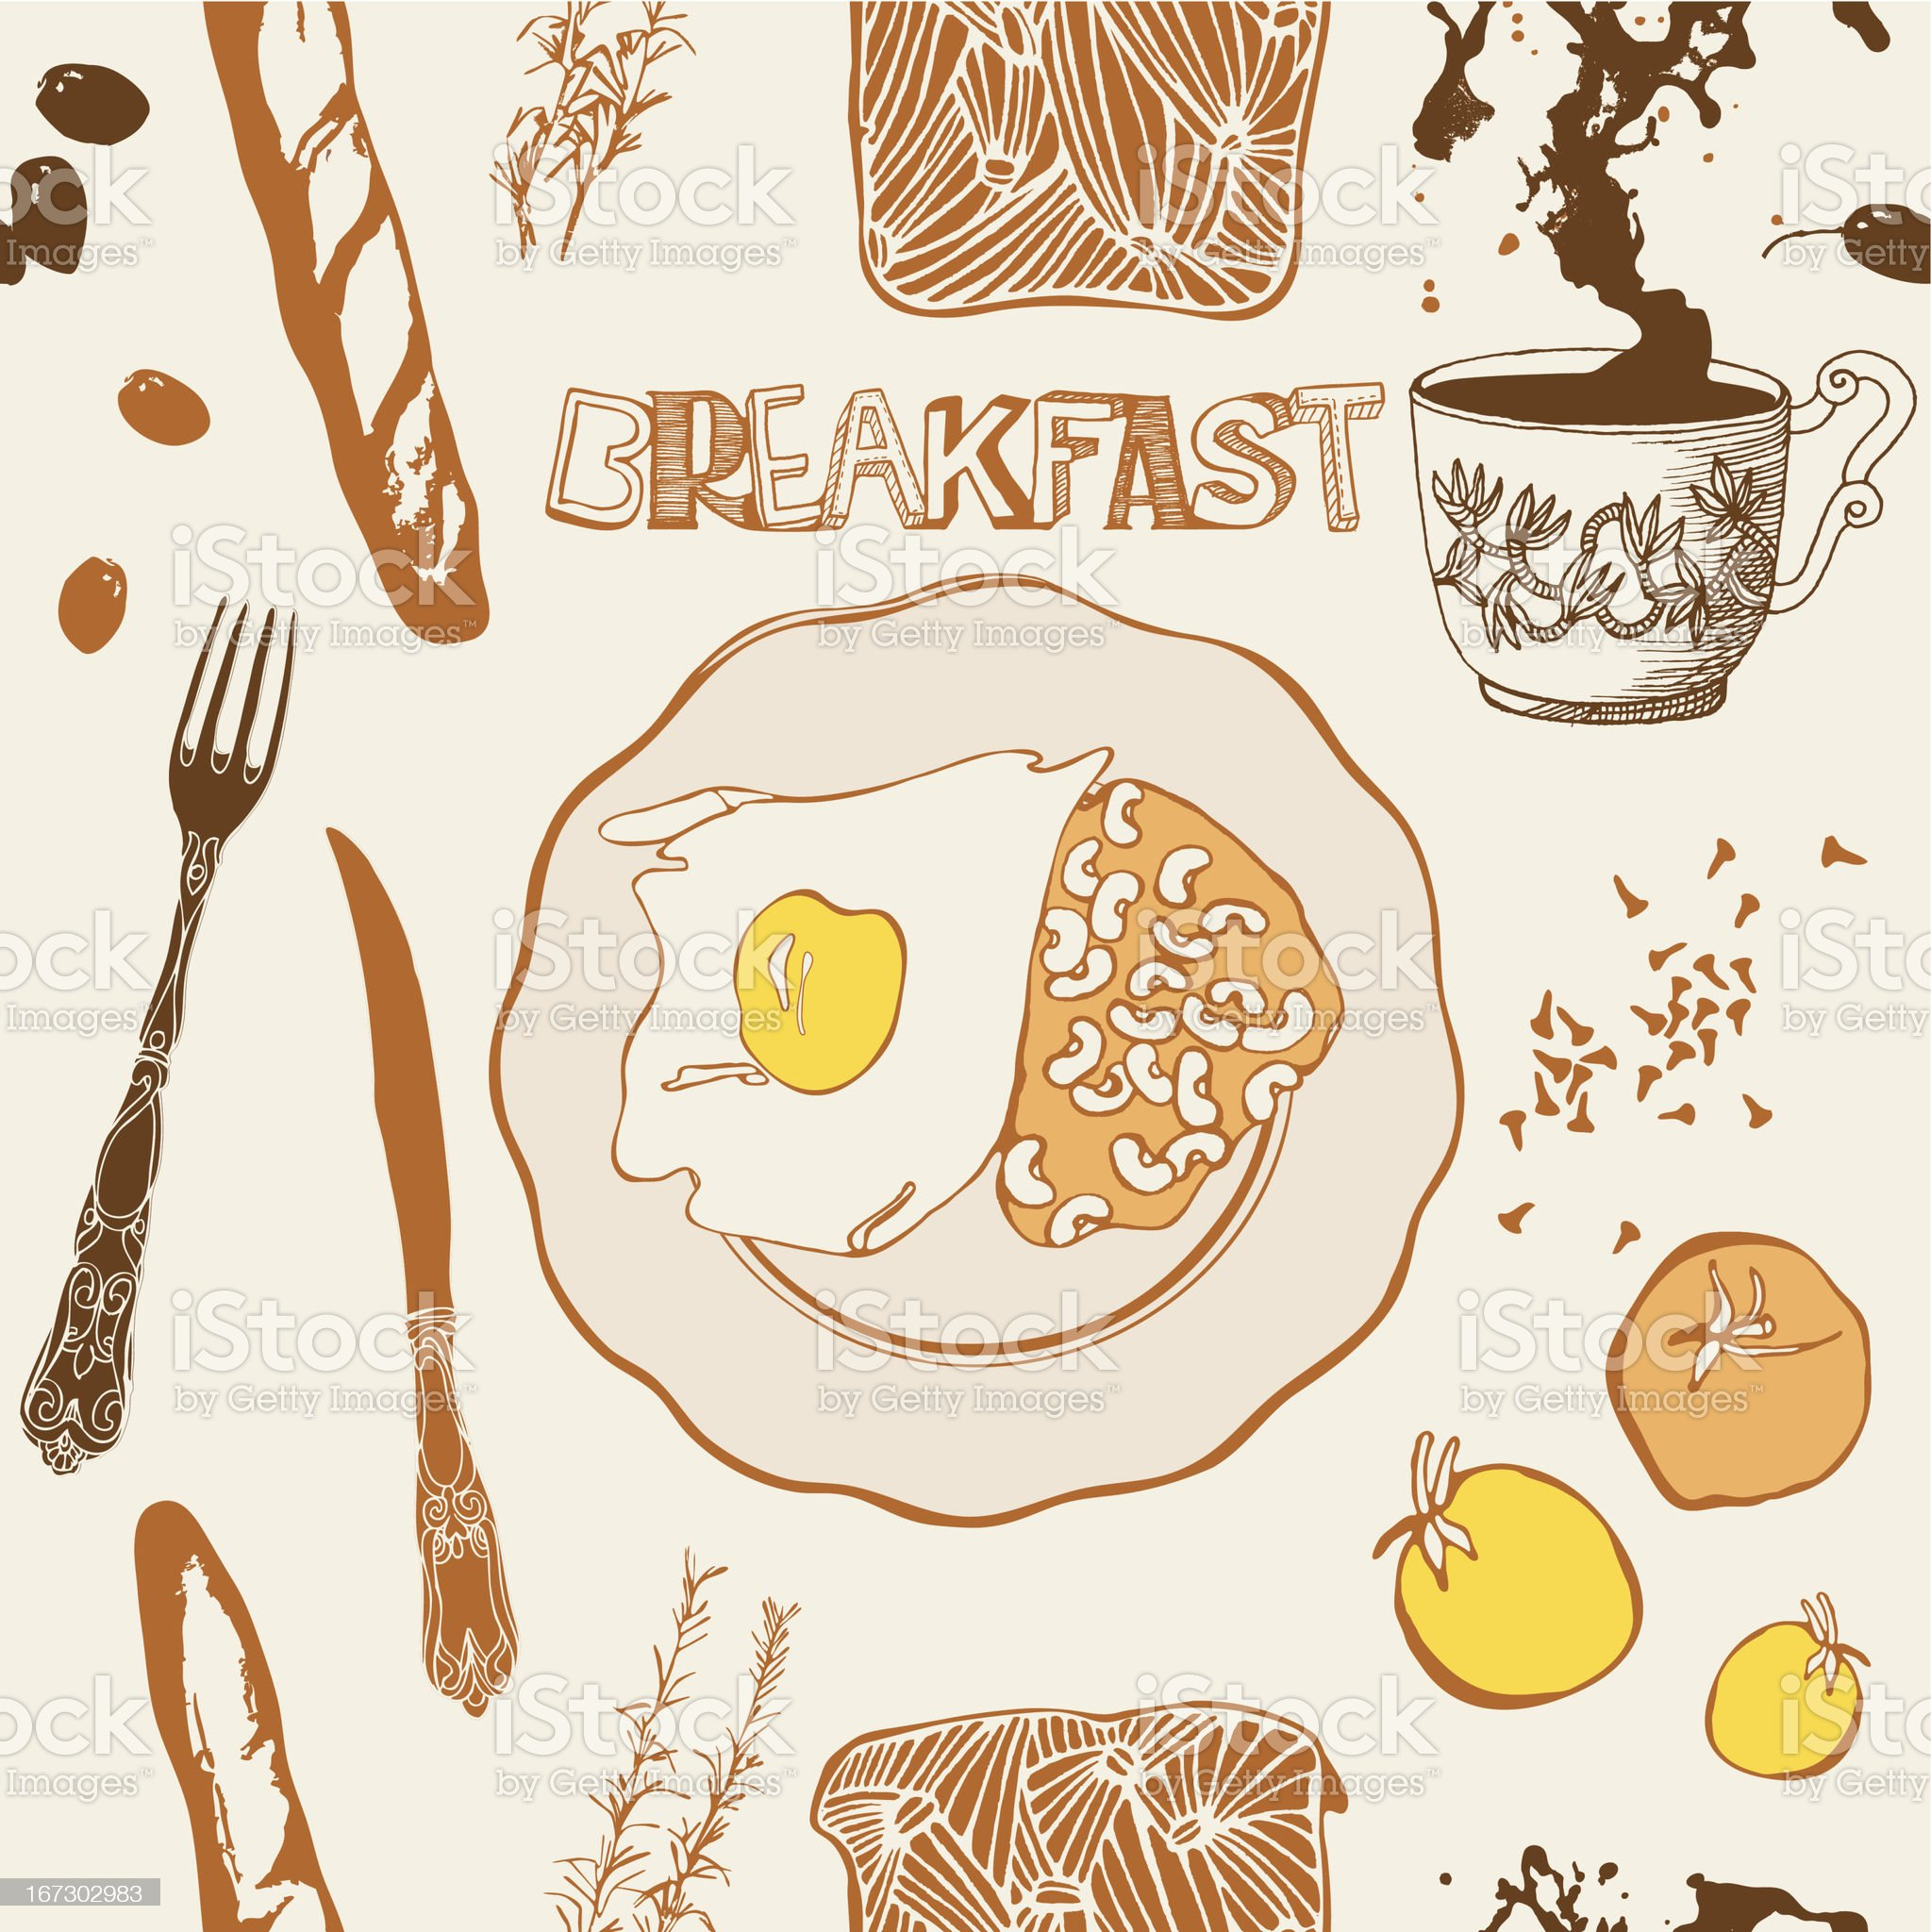 Breakfast card. royalty-free stock vector art